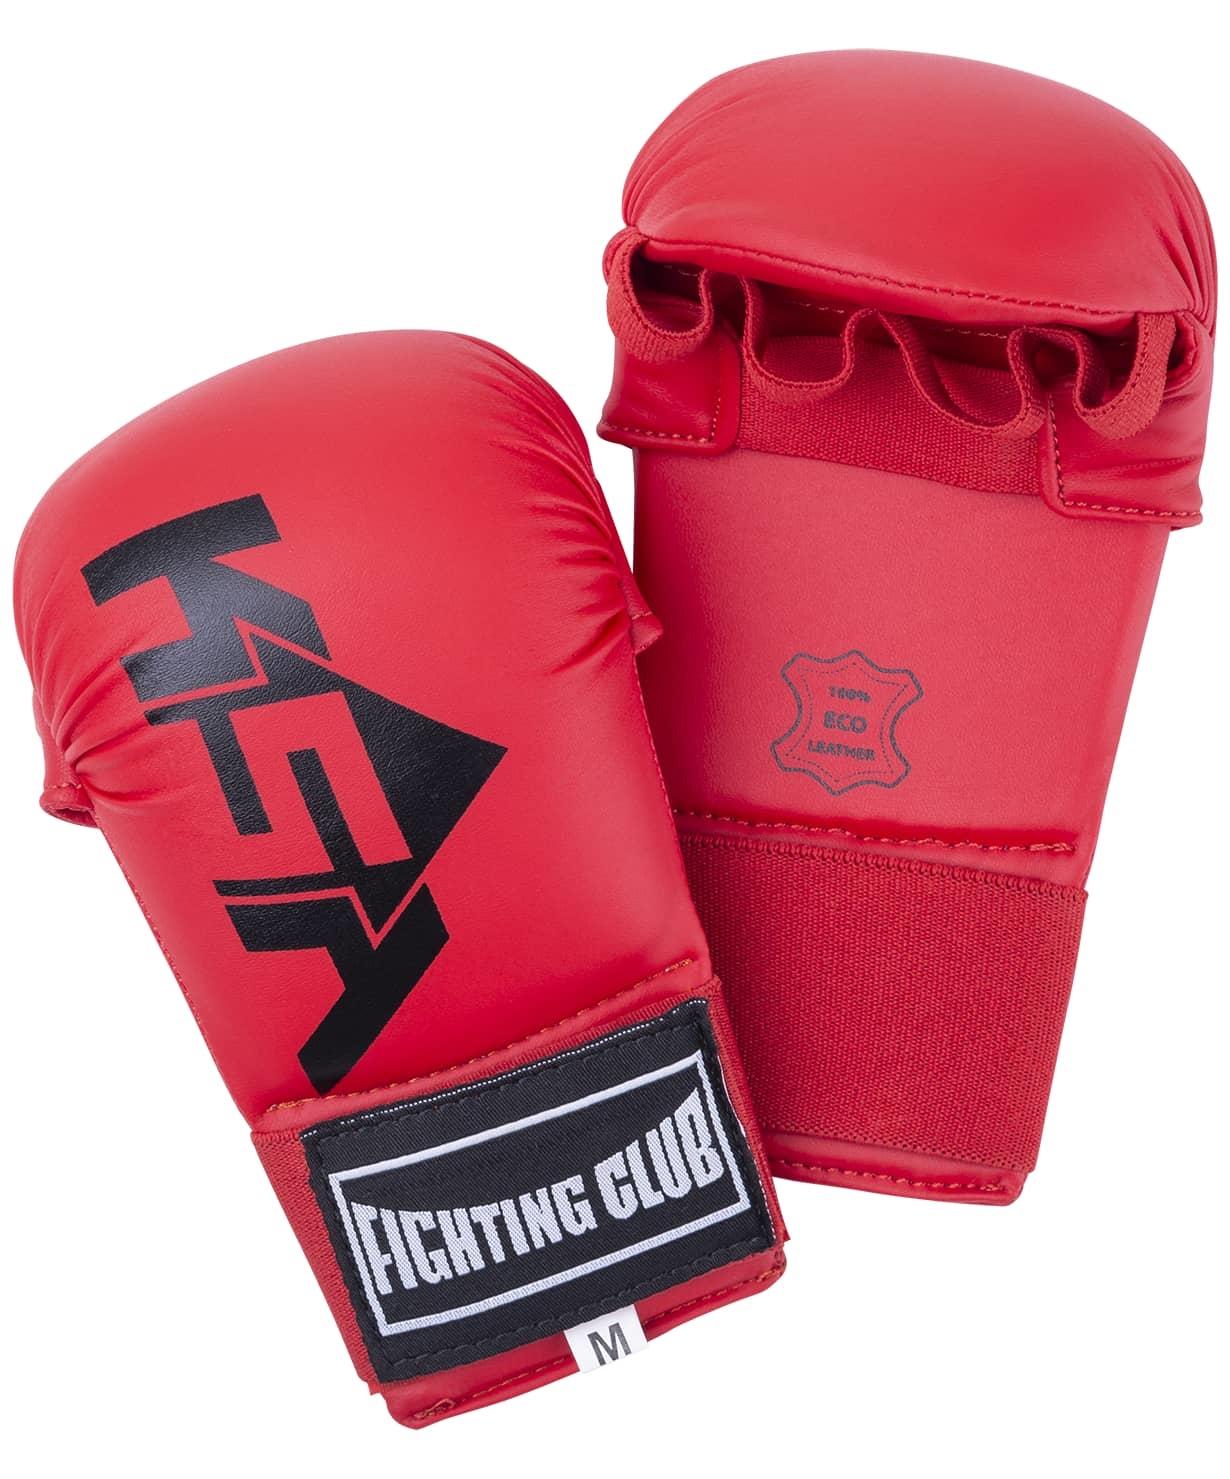 Накладки для карате Slam Red, к/з